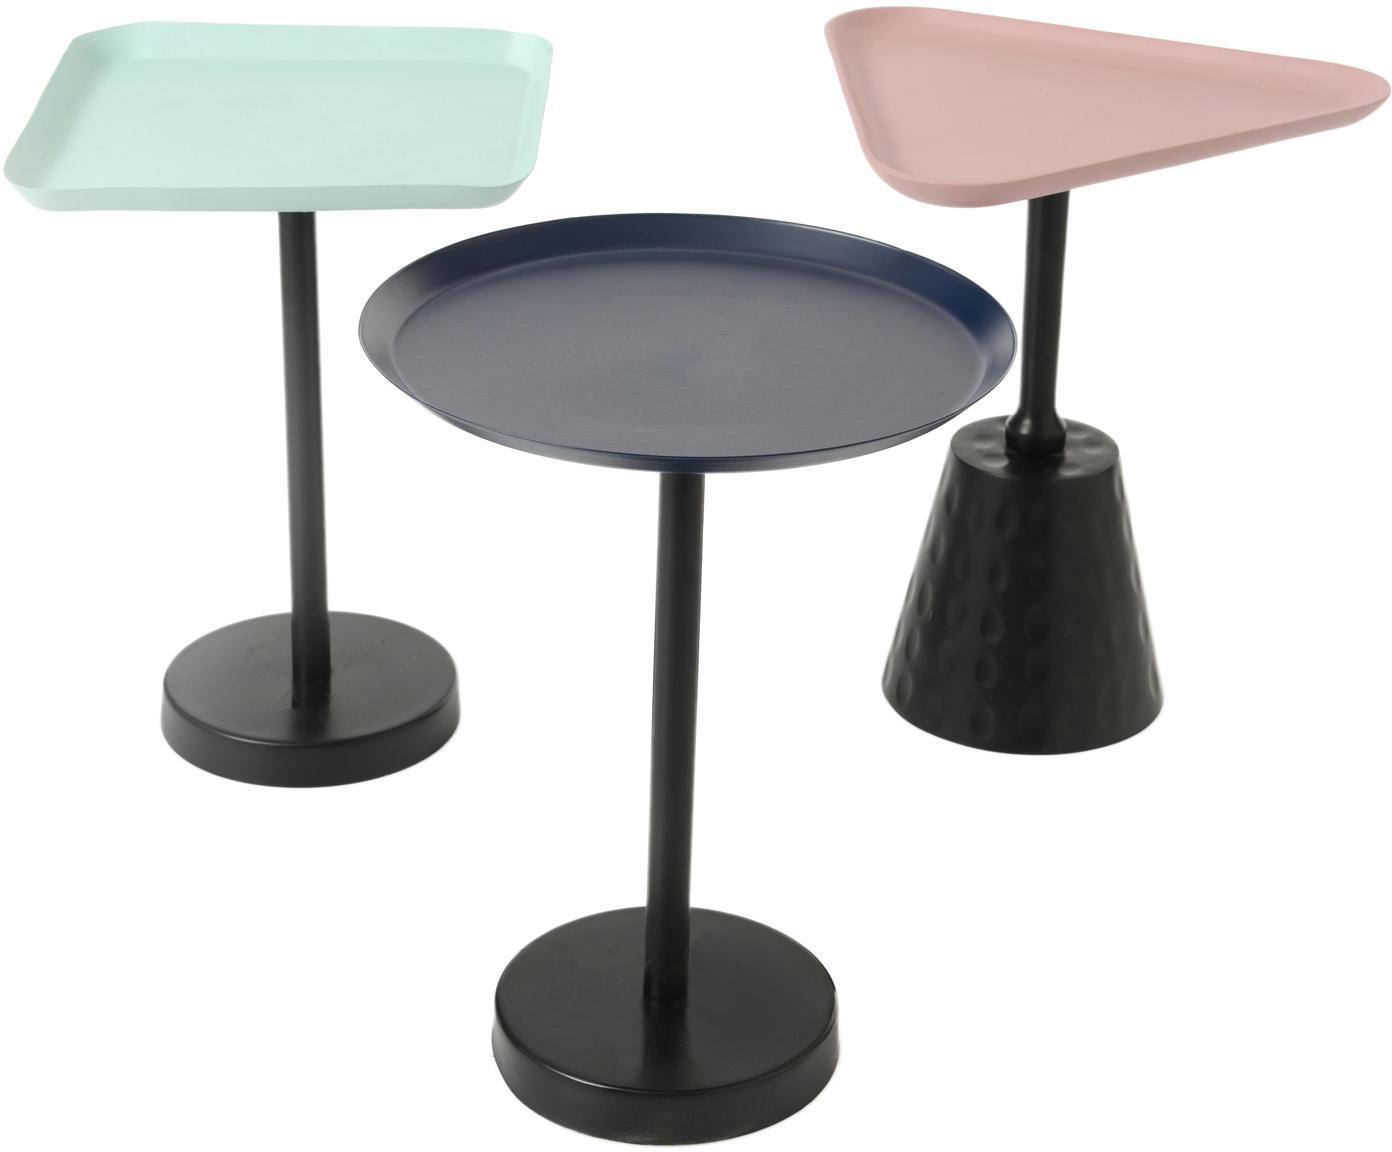 Set de mesas auxiliares Brunomali, 3pzas., Multicolor, Tamaños diferentes